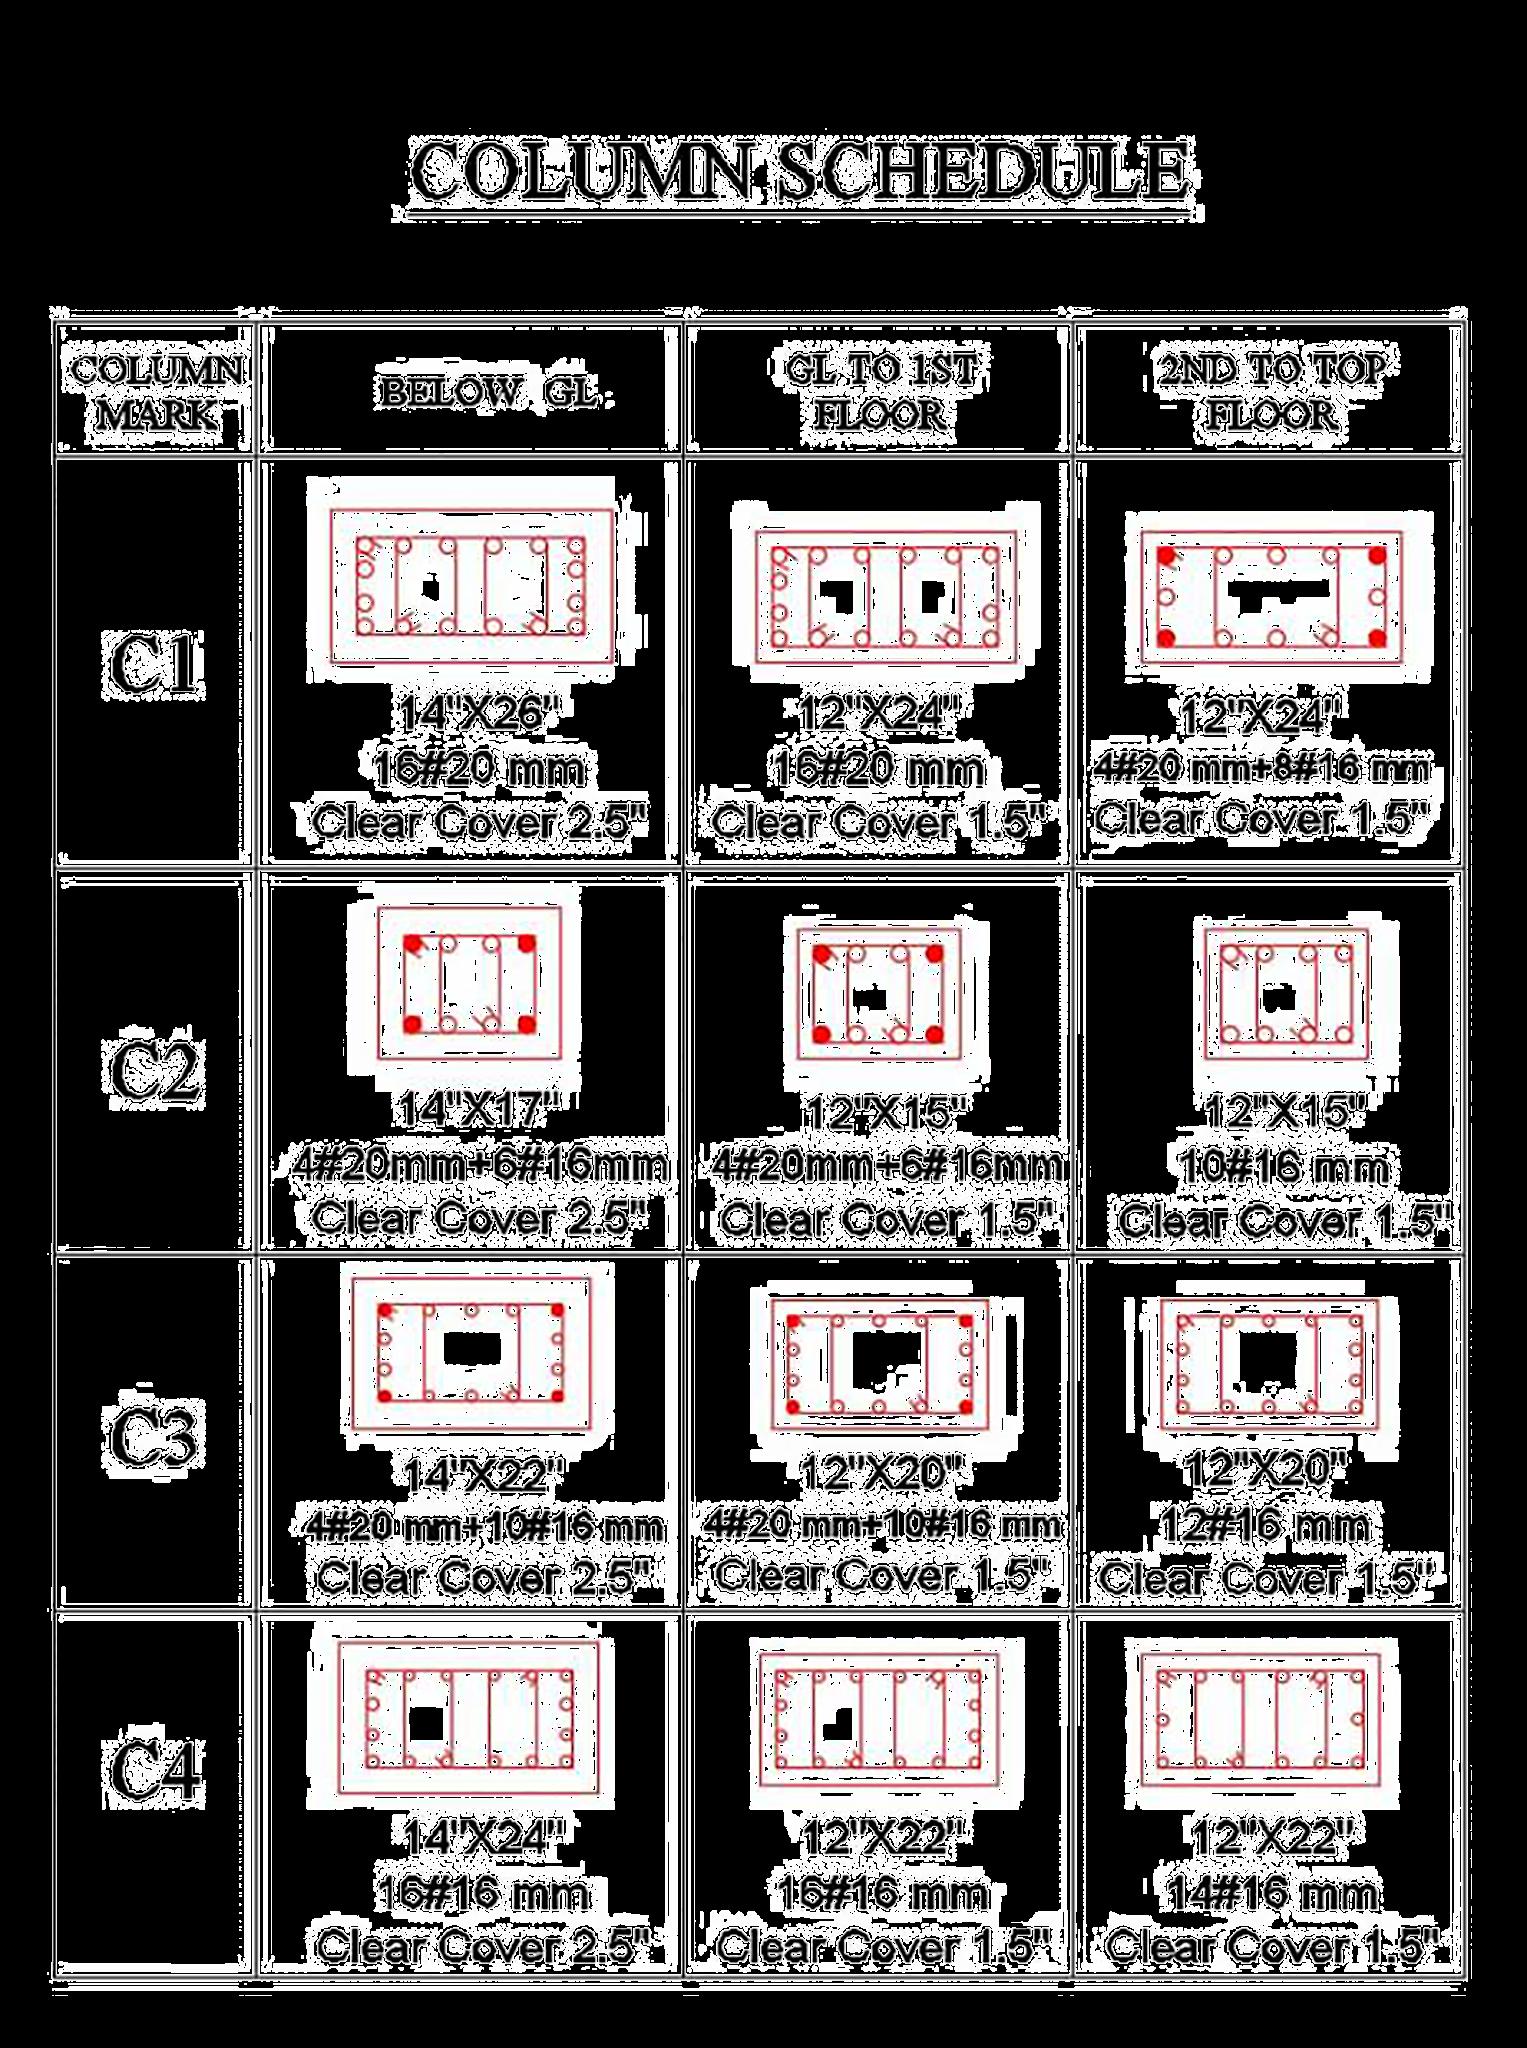 6 Storey Building Column Schedule